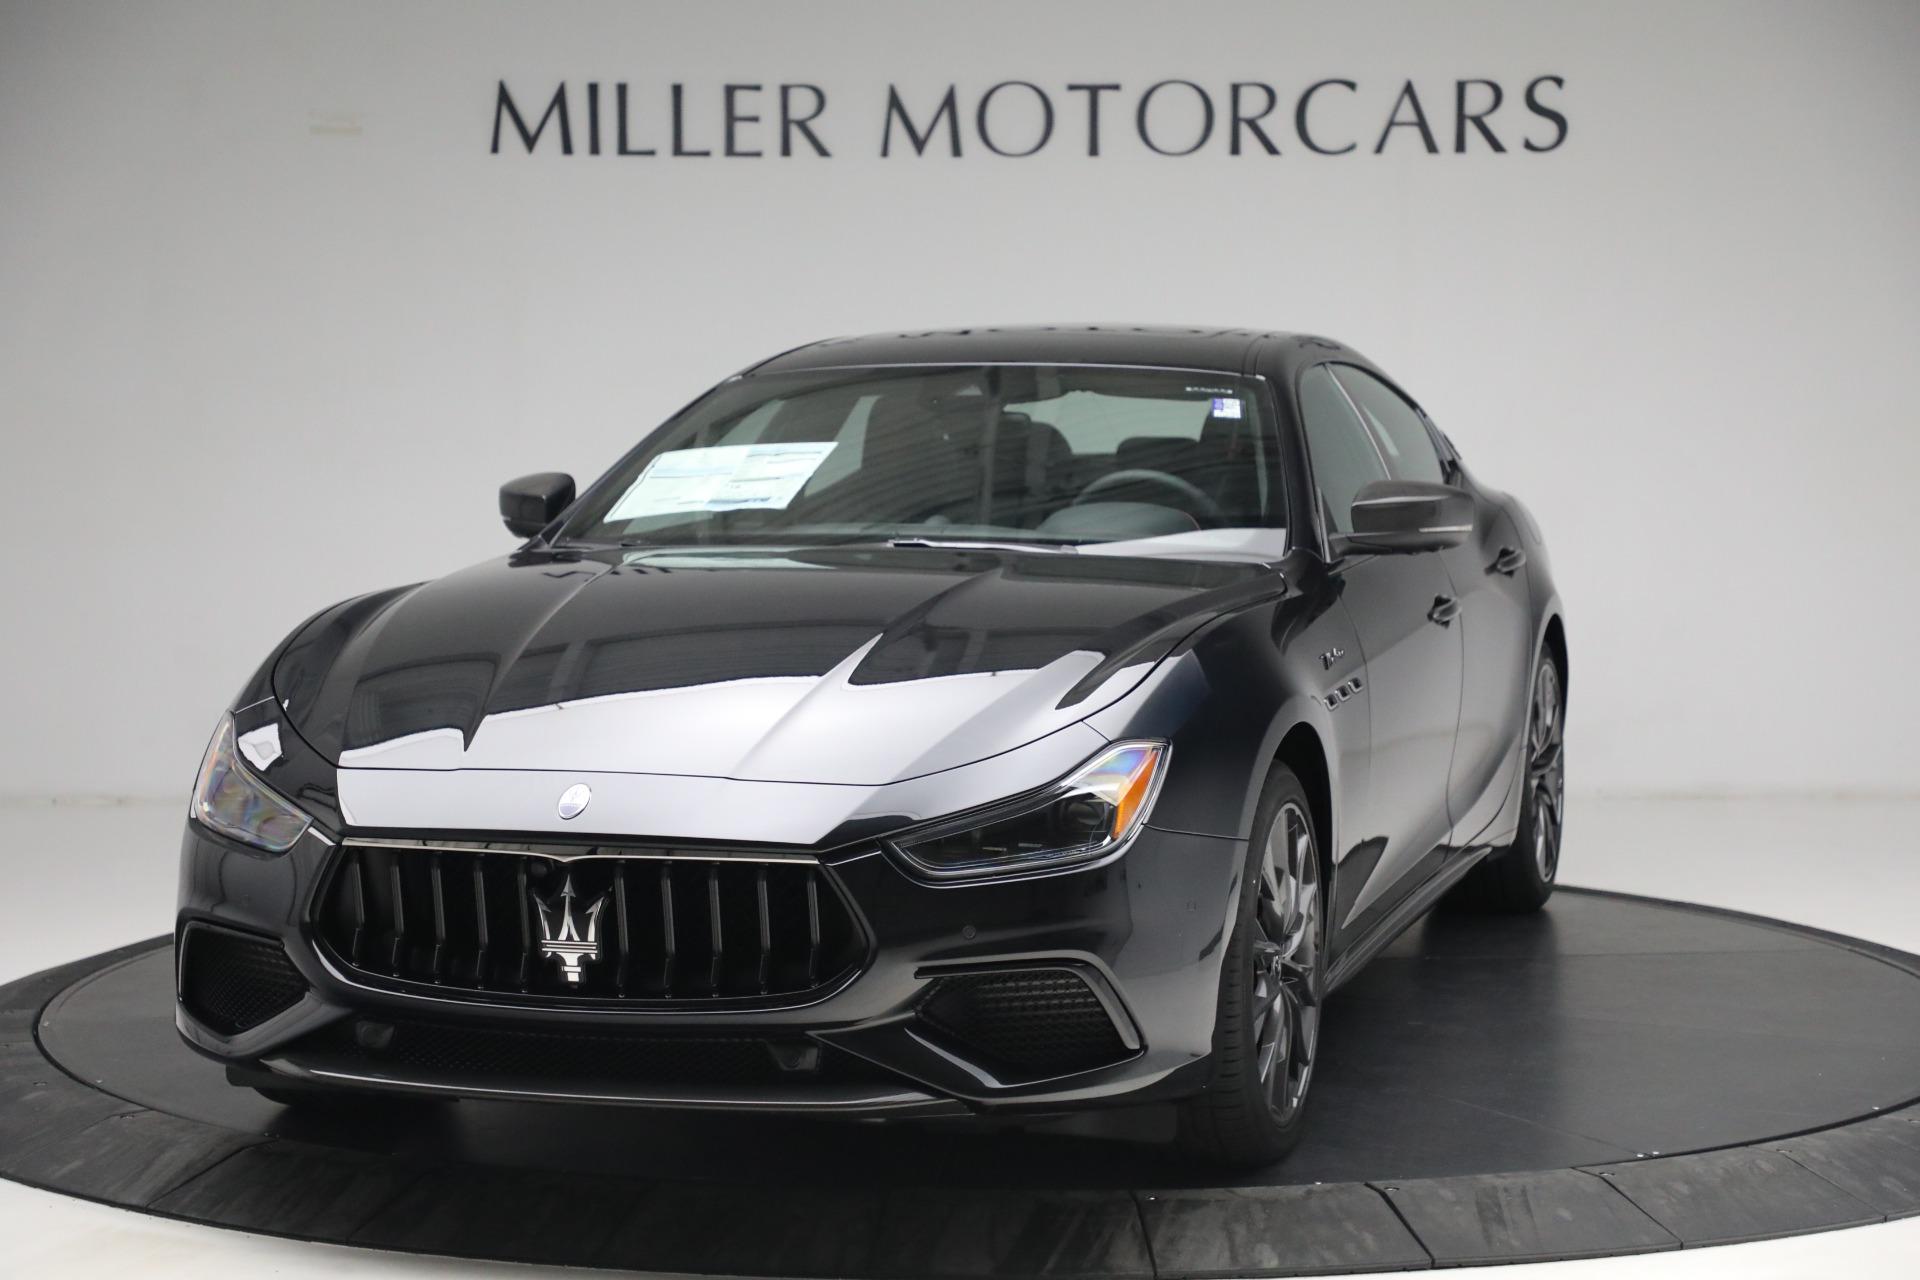 New 2022 Maserati Ghibli Modena Q4 for sale $103,855 at Maserati of Greenwich in Greenwich CT 06830 1